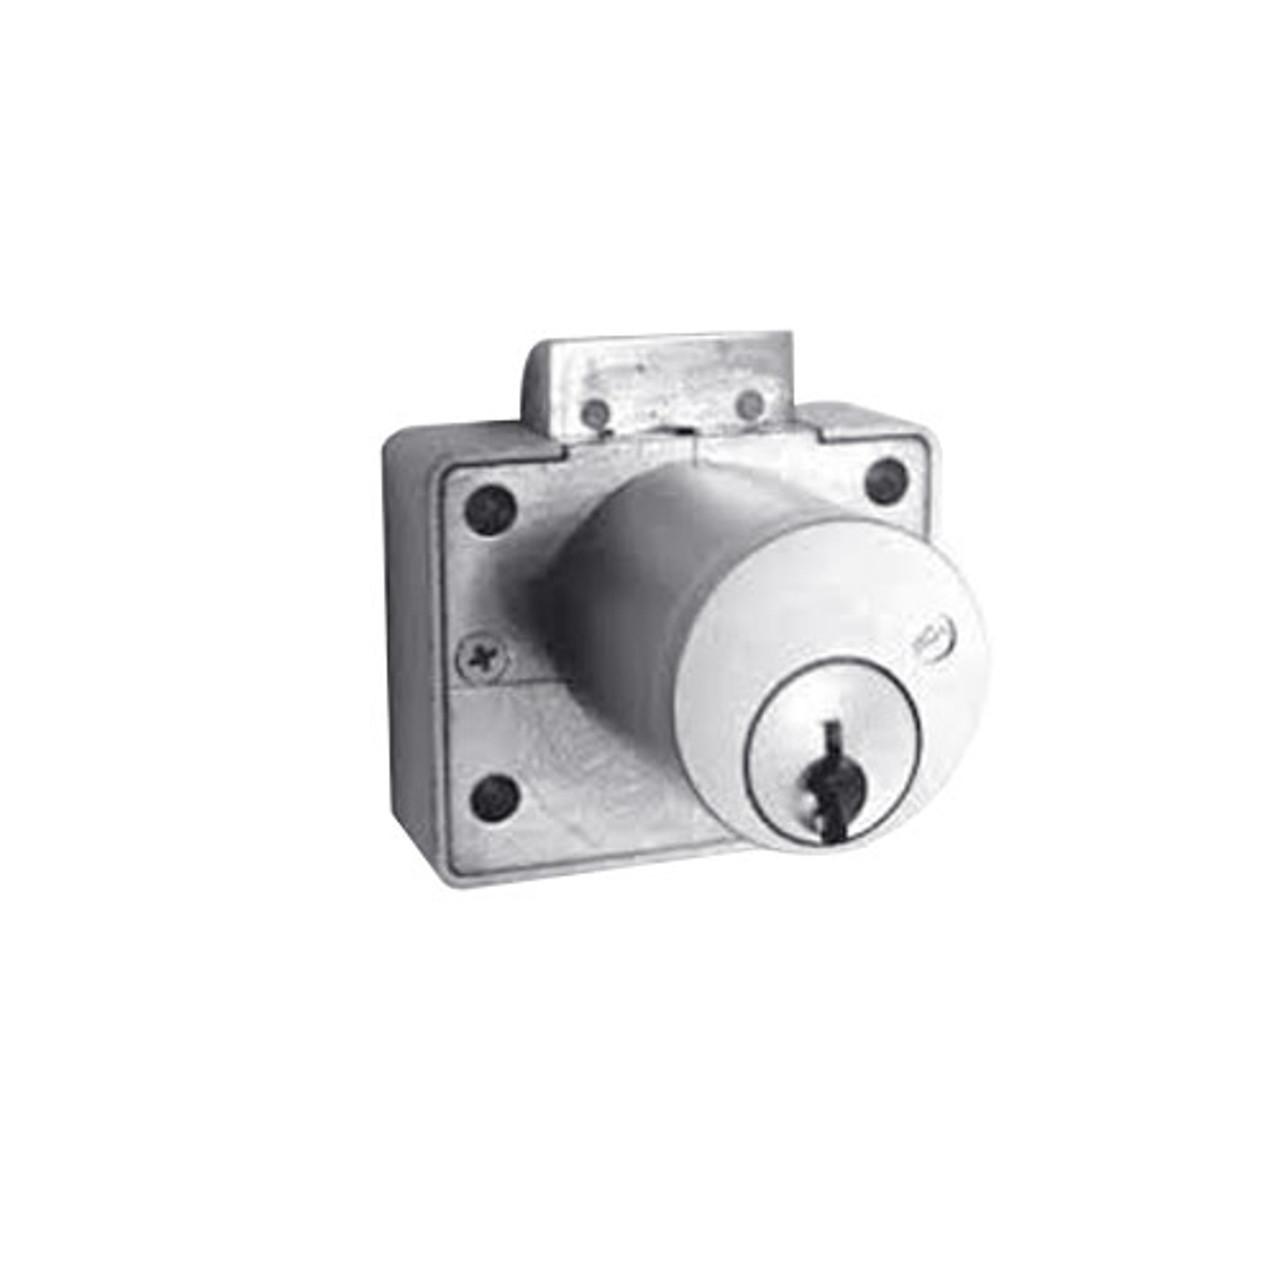 Olympus L78V-VH-KA101-26D-1-1/8 Drawer Latch Cabinet Lock in Satin Chrome Finish